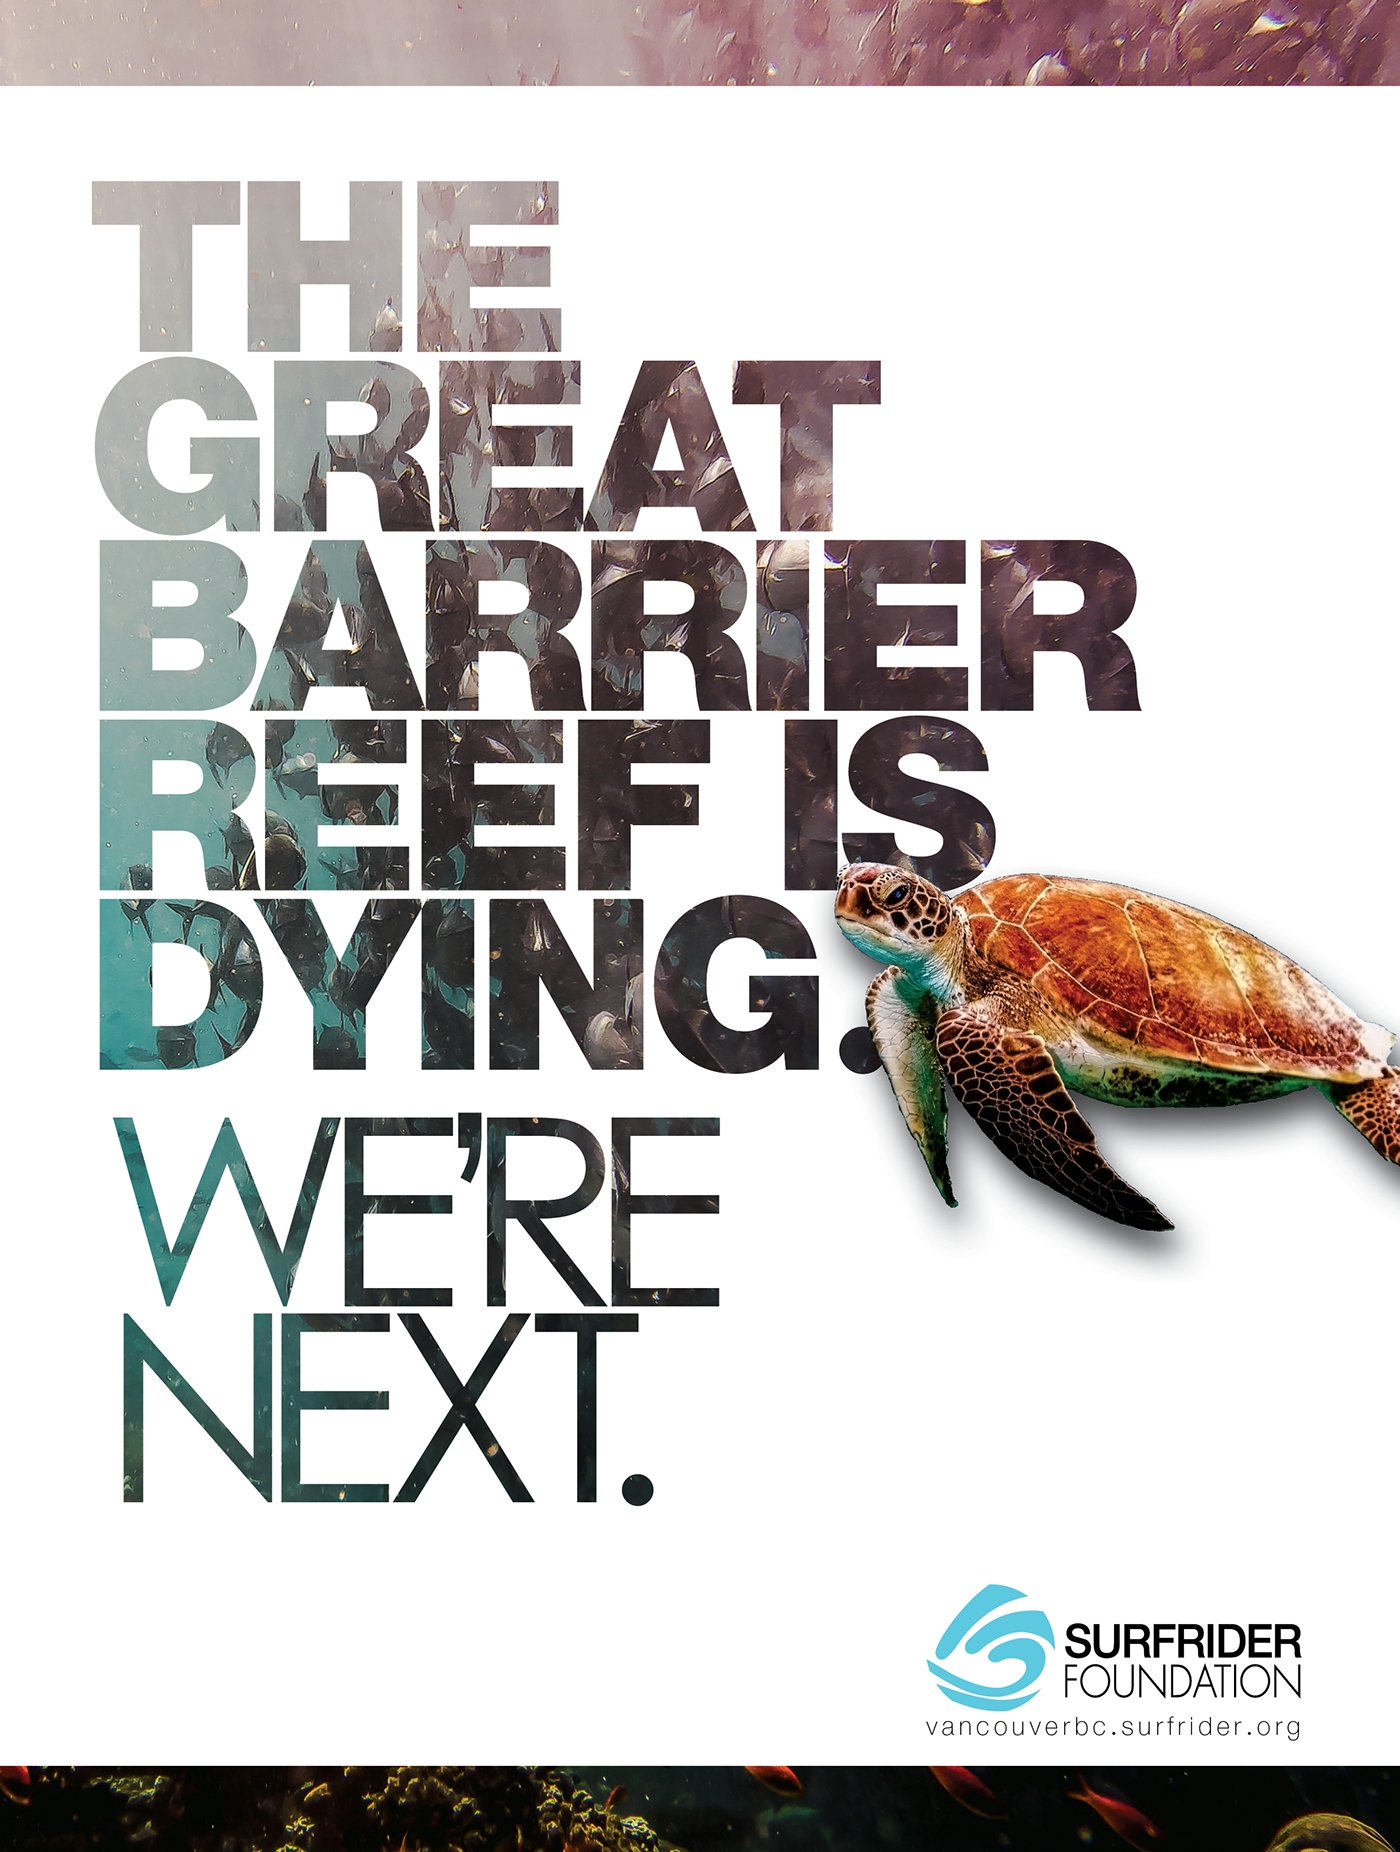 SurfRider Foundation Advertising  Ocean copywriting  Turtle